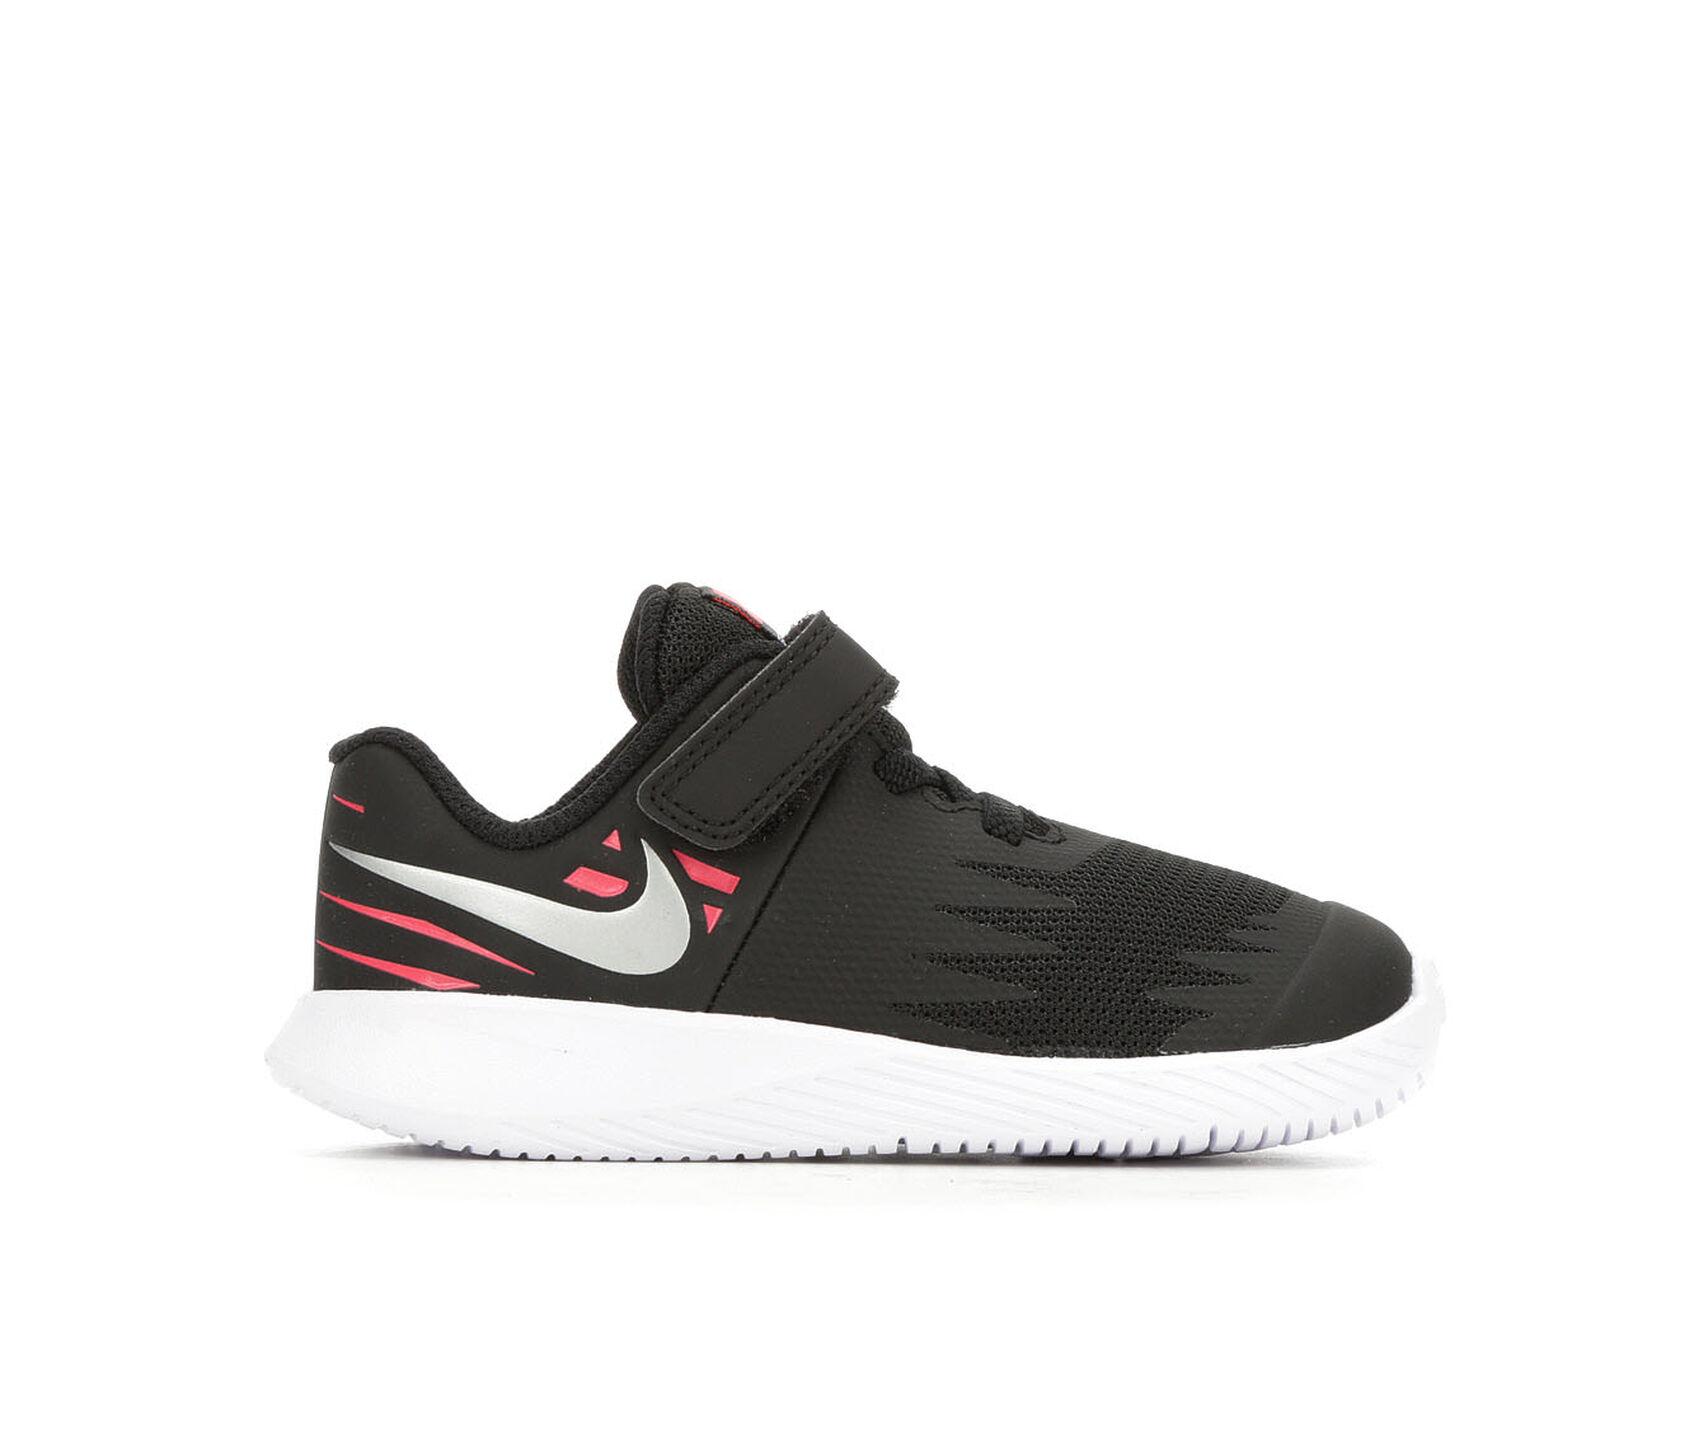 75987ee4 Girls' Nike Infant & Toddler Star Runner Athletic Shoes